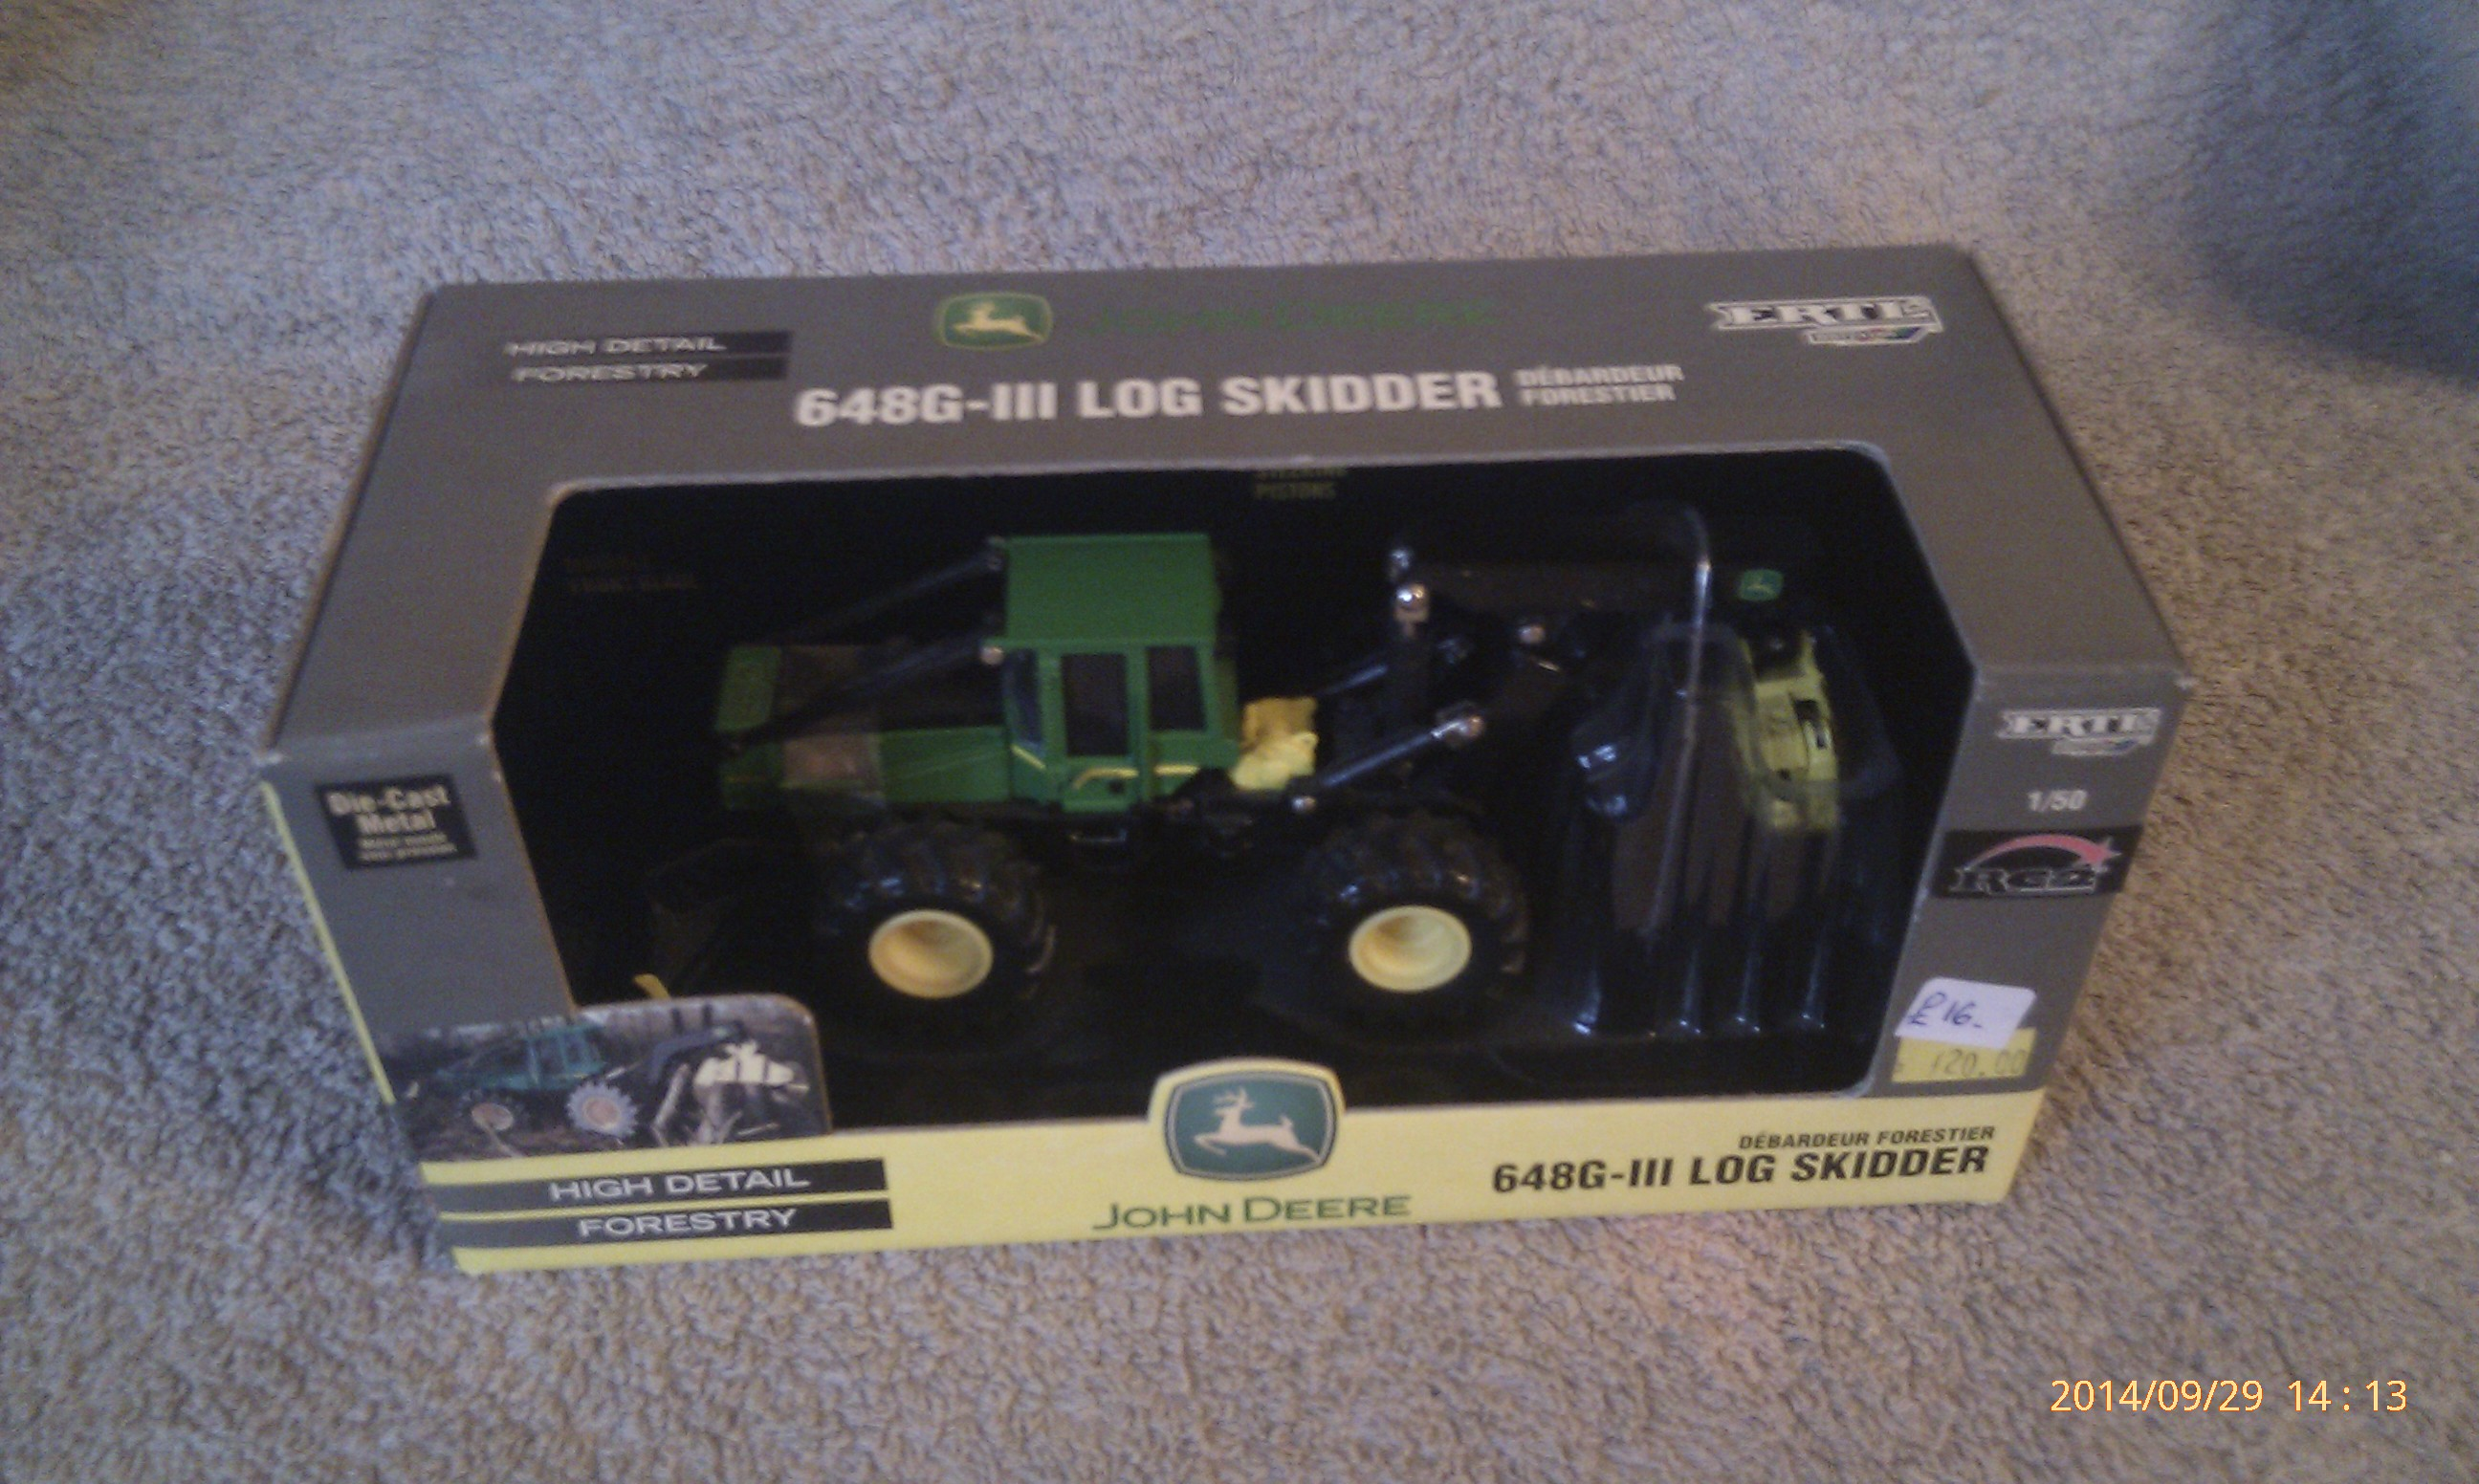 John Deere 648G-III Log Skidder - ERTL